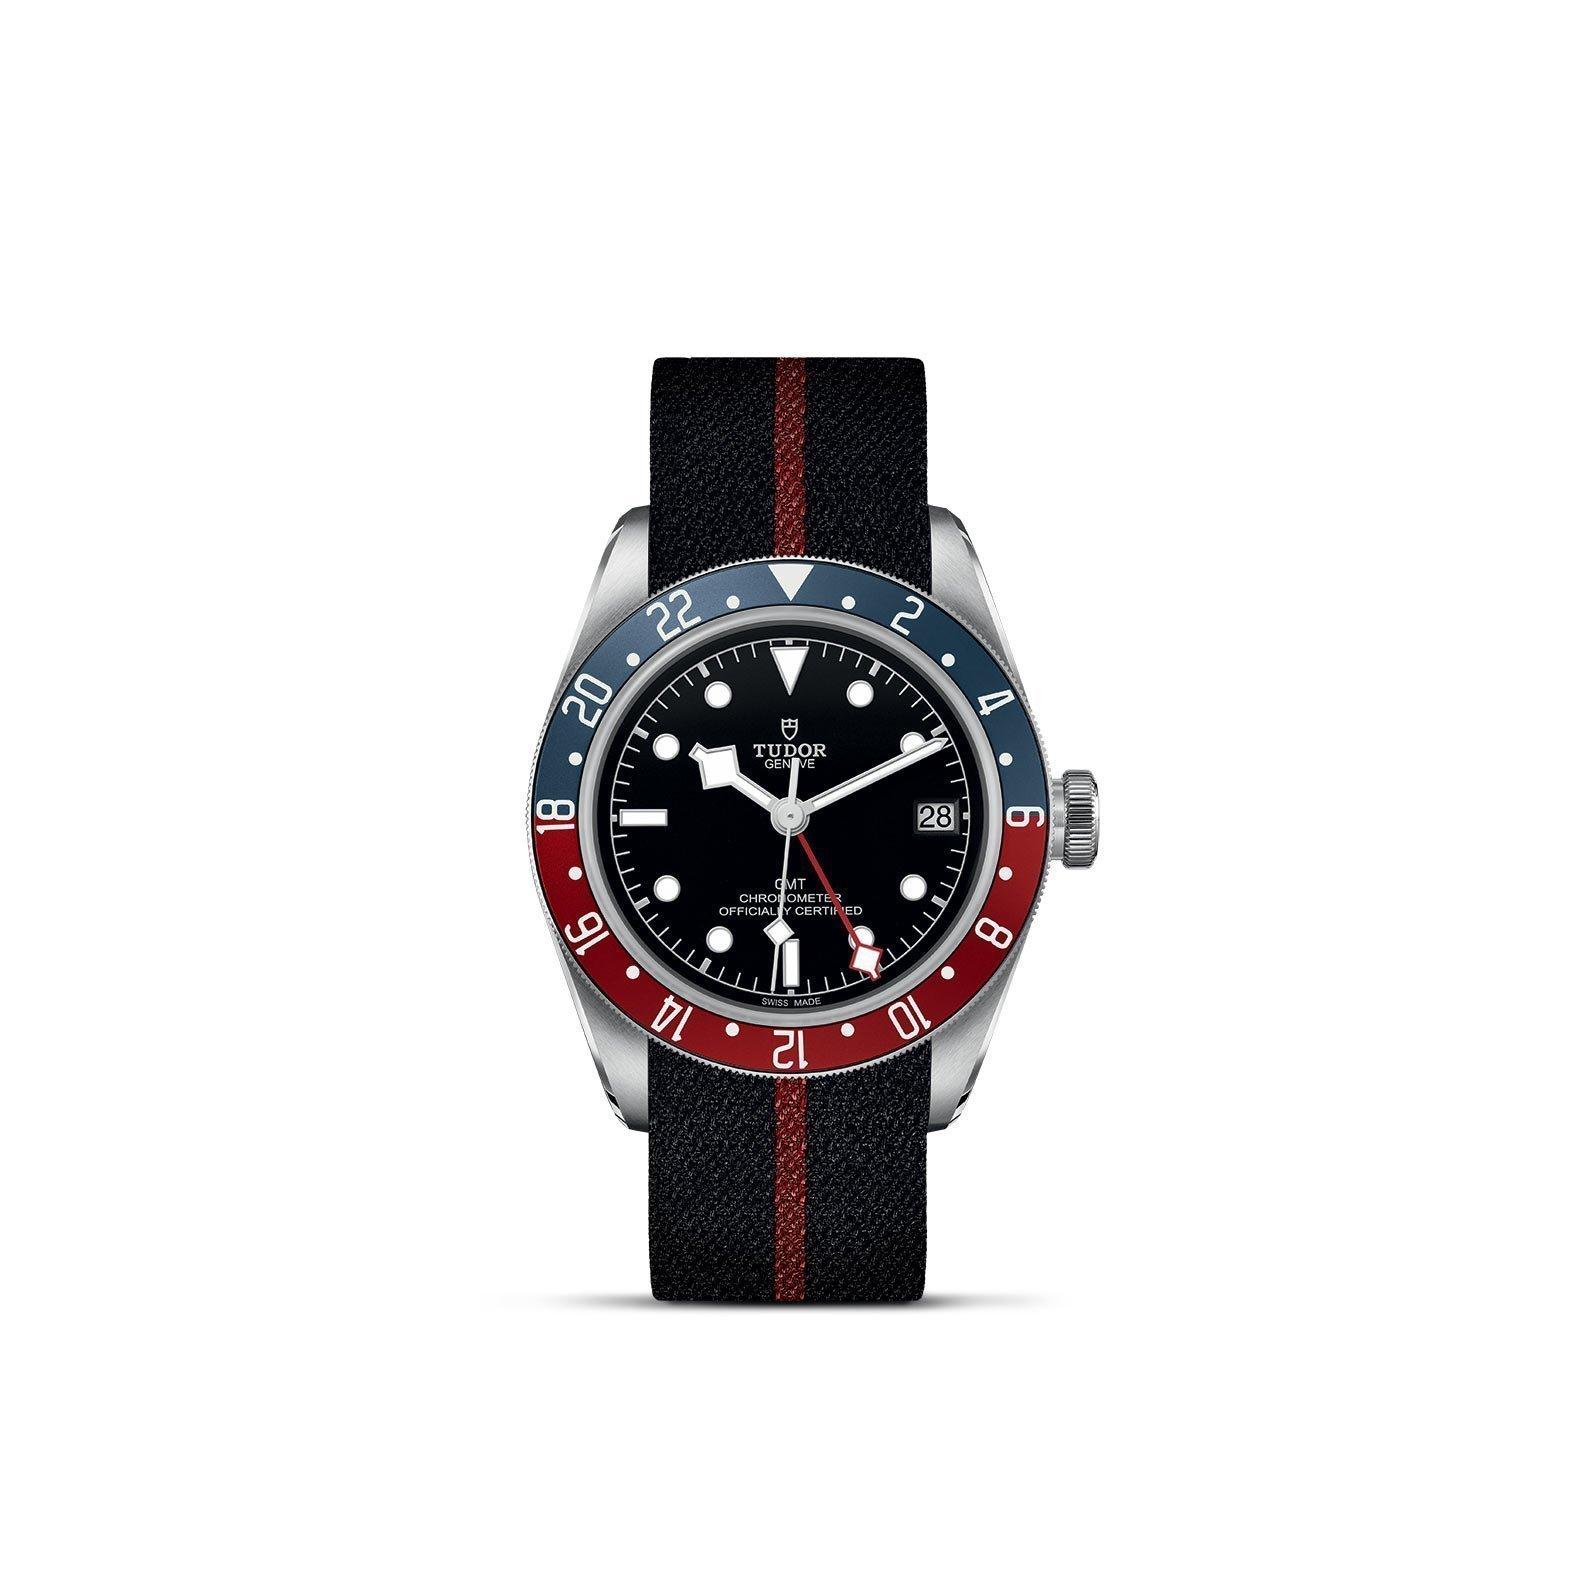 Montre TUDOR Black Bay GMT boîtier en acier, 41mm, bracelet en tissu vue 1